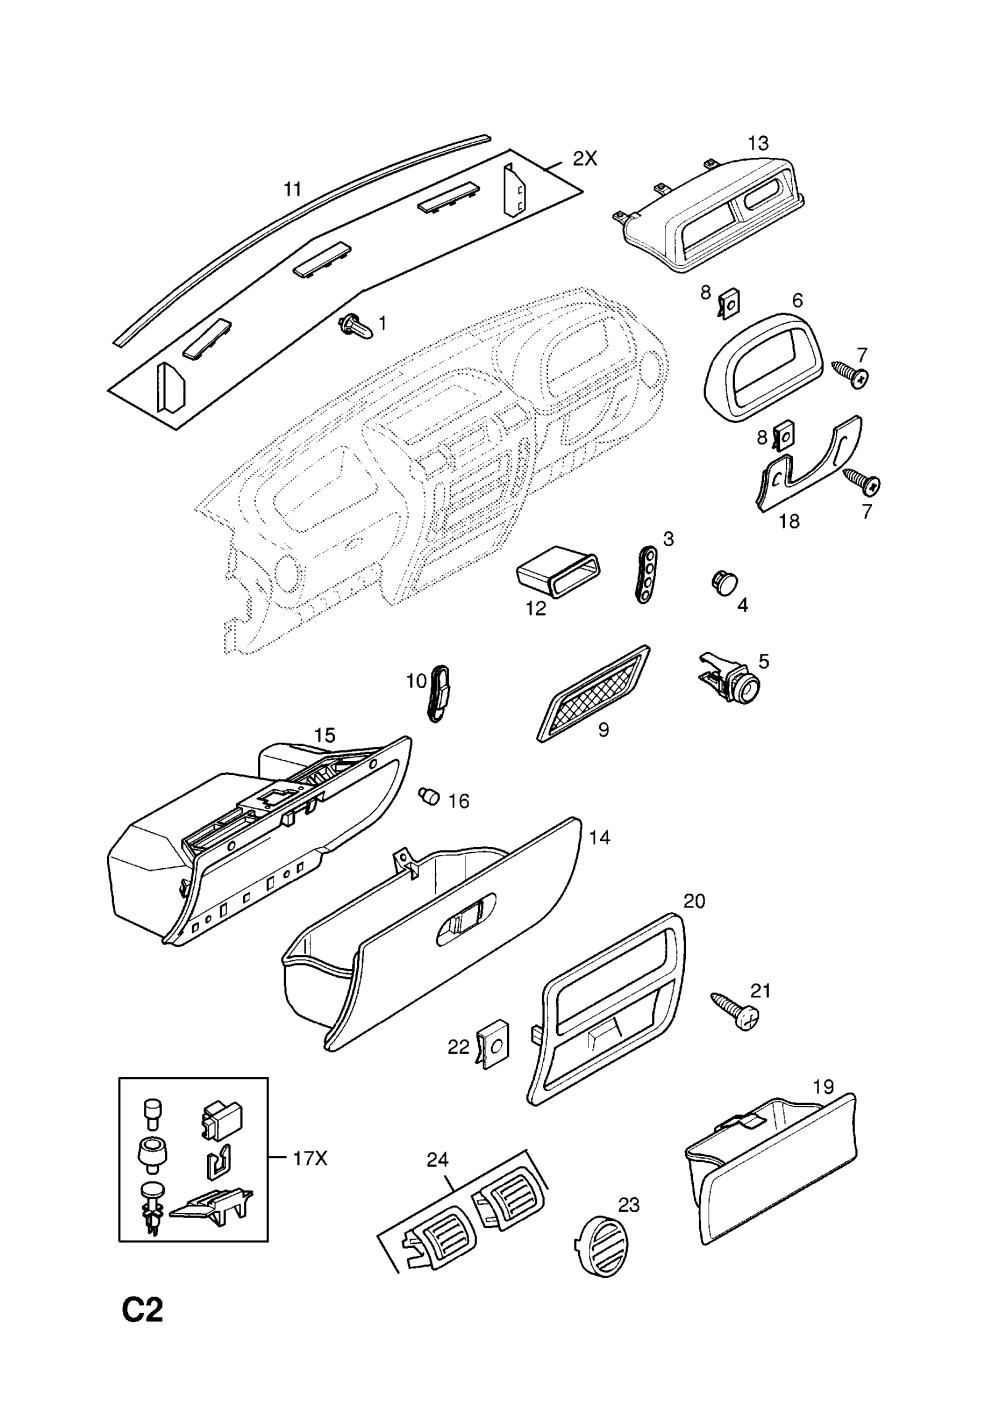 medium resolution of epc fuse box wiring diagram weekepc fuse box 20